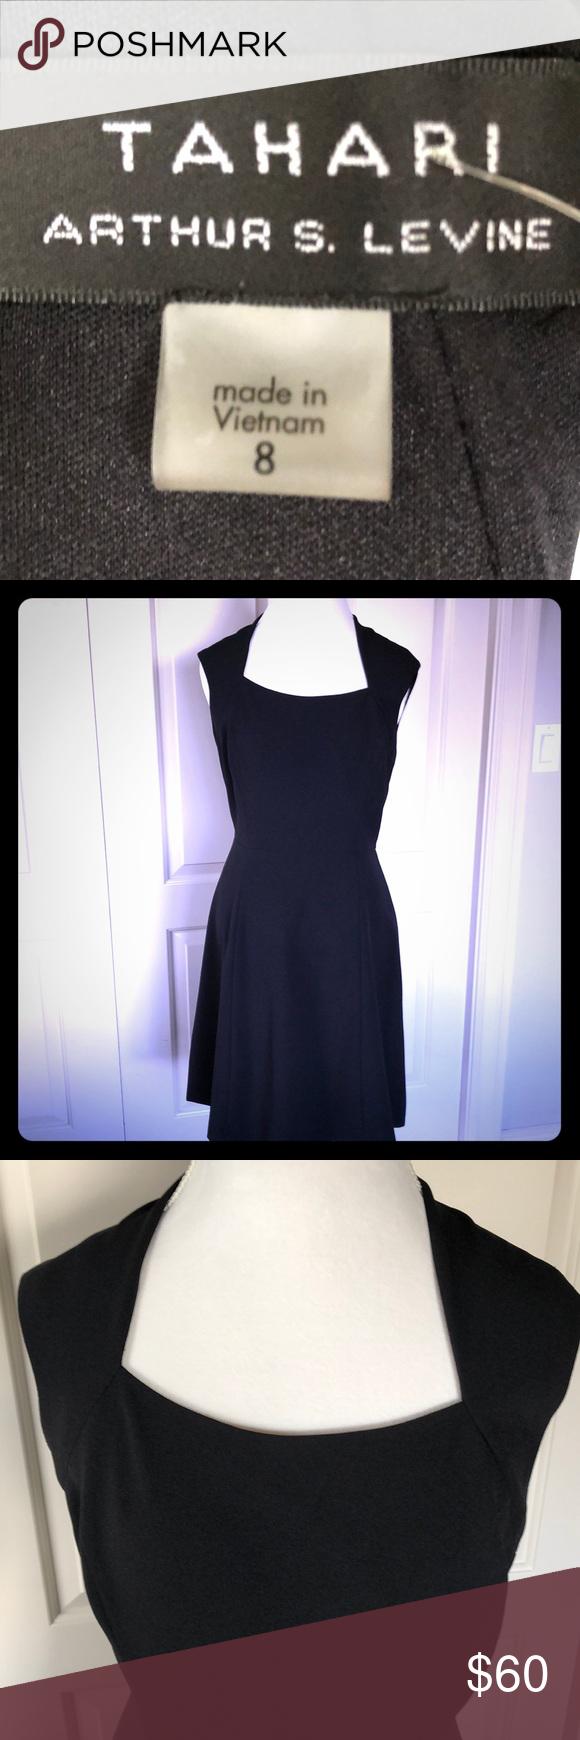 New Tahari Black Dress Tahari Black Dress Fully Lined Back Zipper Perfect For The Office Or Just A Cocktail Dress Shou Black Dress Tahari Dress Dresses [ 1740 x 580 Pixel ]